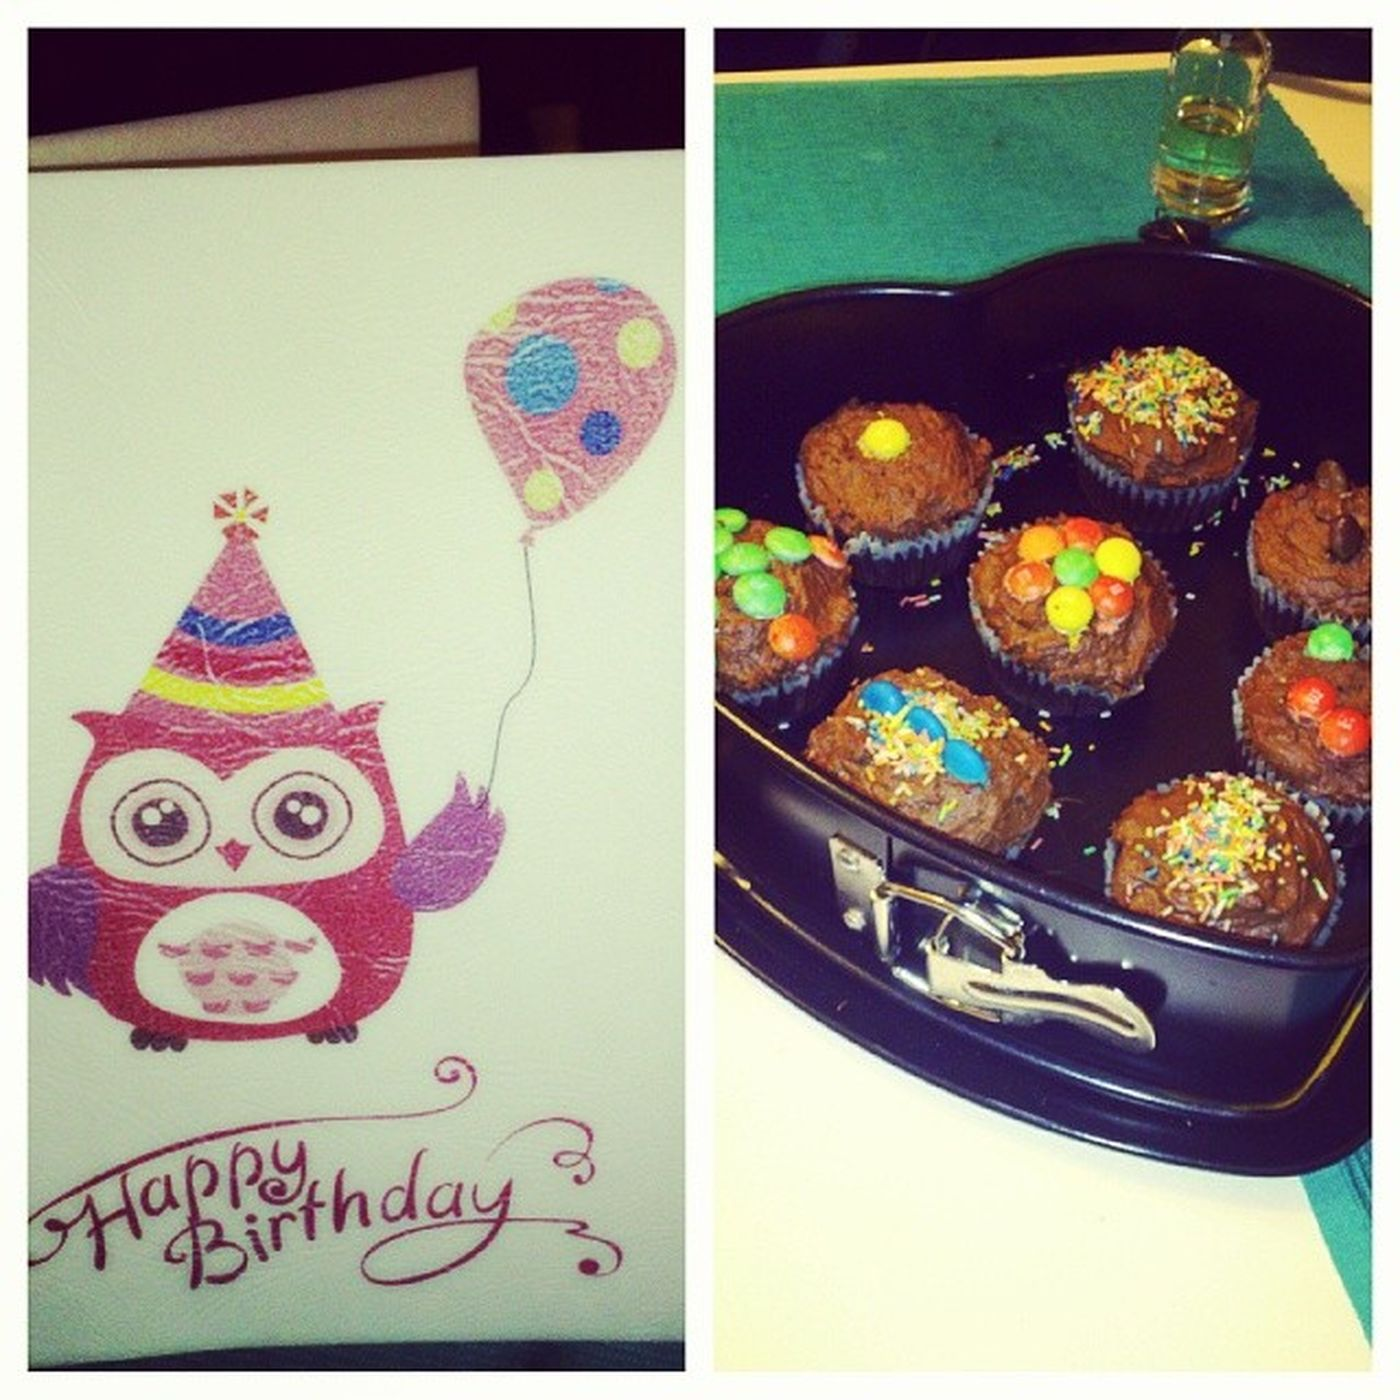 Happy birthday @tubarozsa HappyBirthday Birthday Gift Cake Smarties Greetingcard